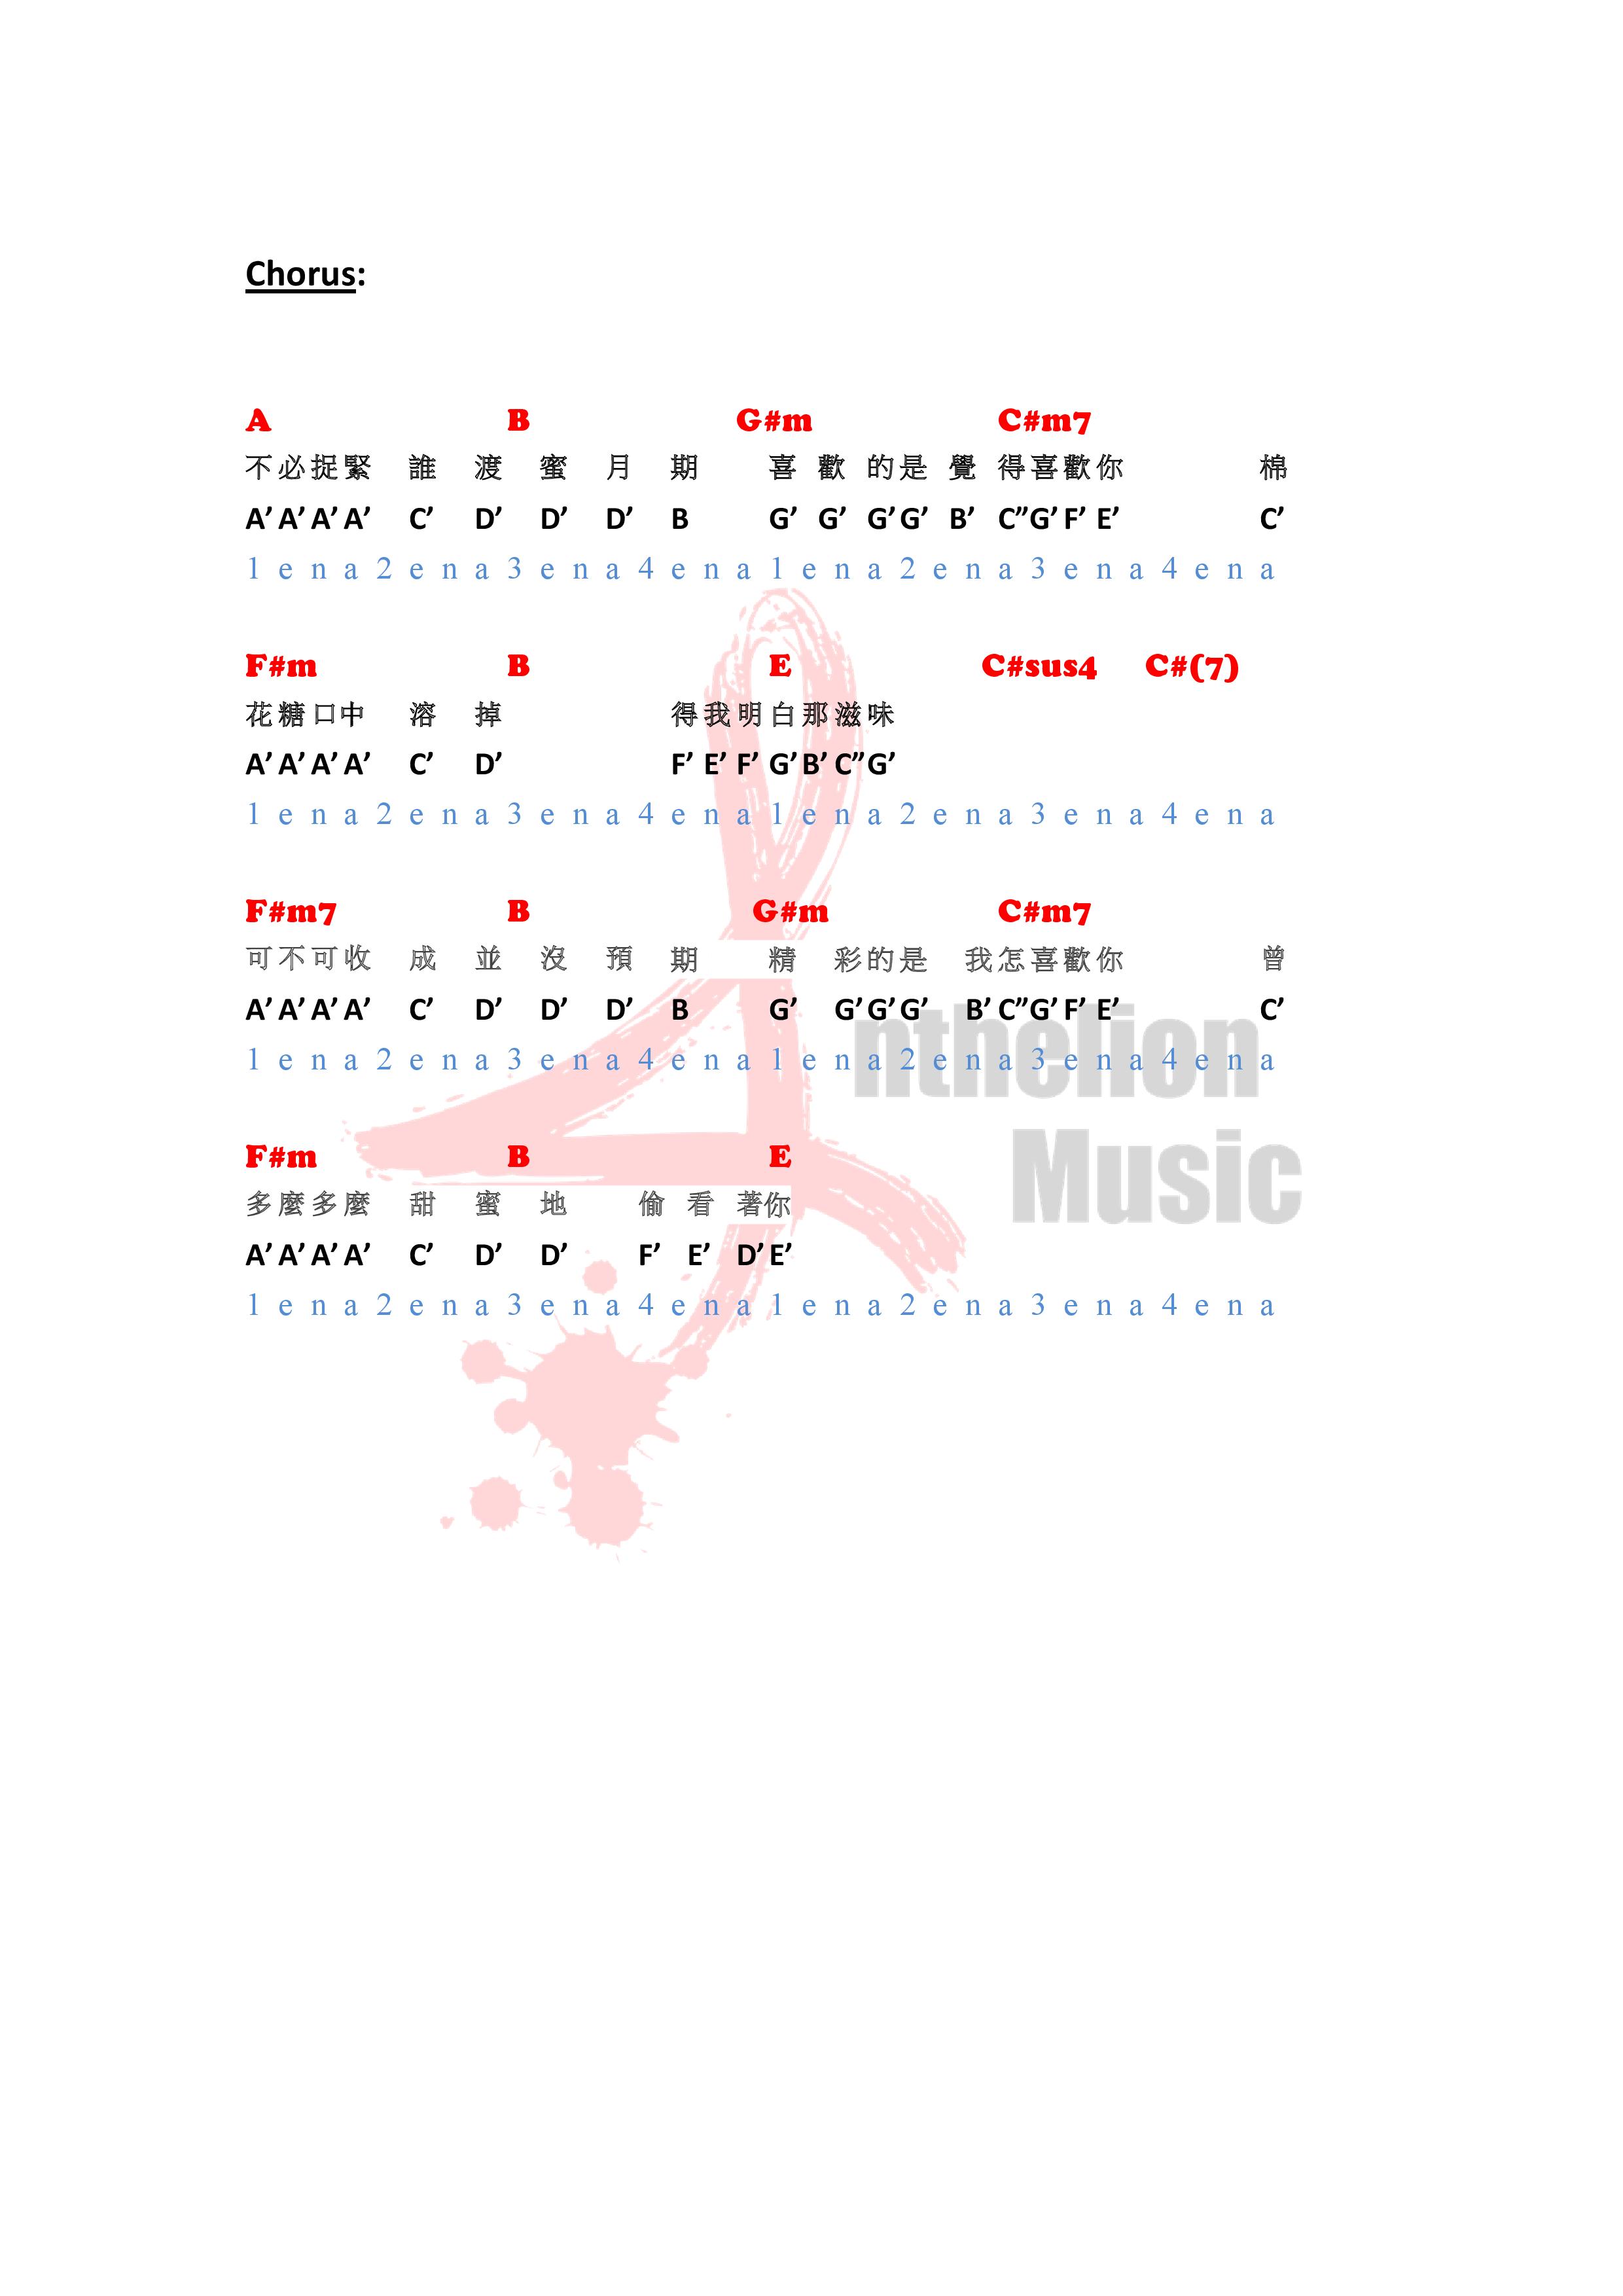 Anthelion Music 譜 template (喜歡喜歡你) E key-1.png